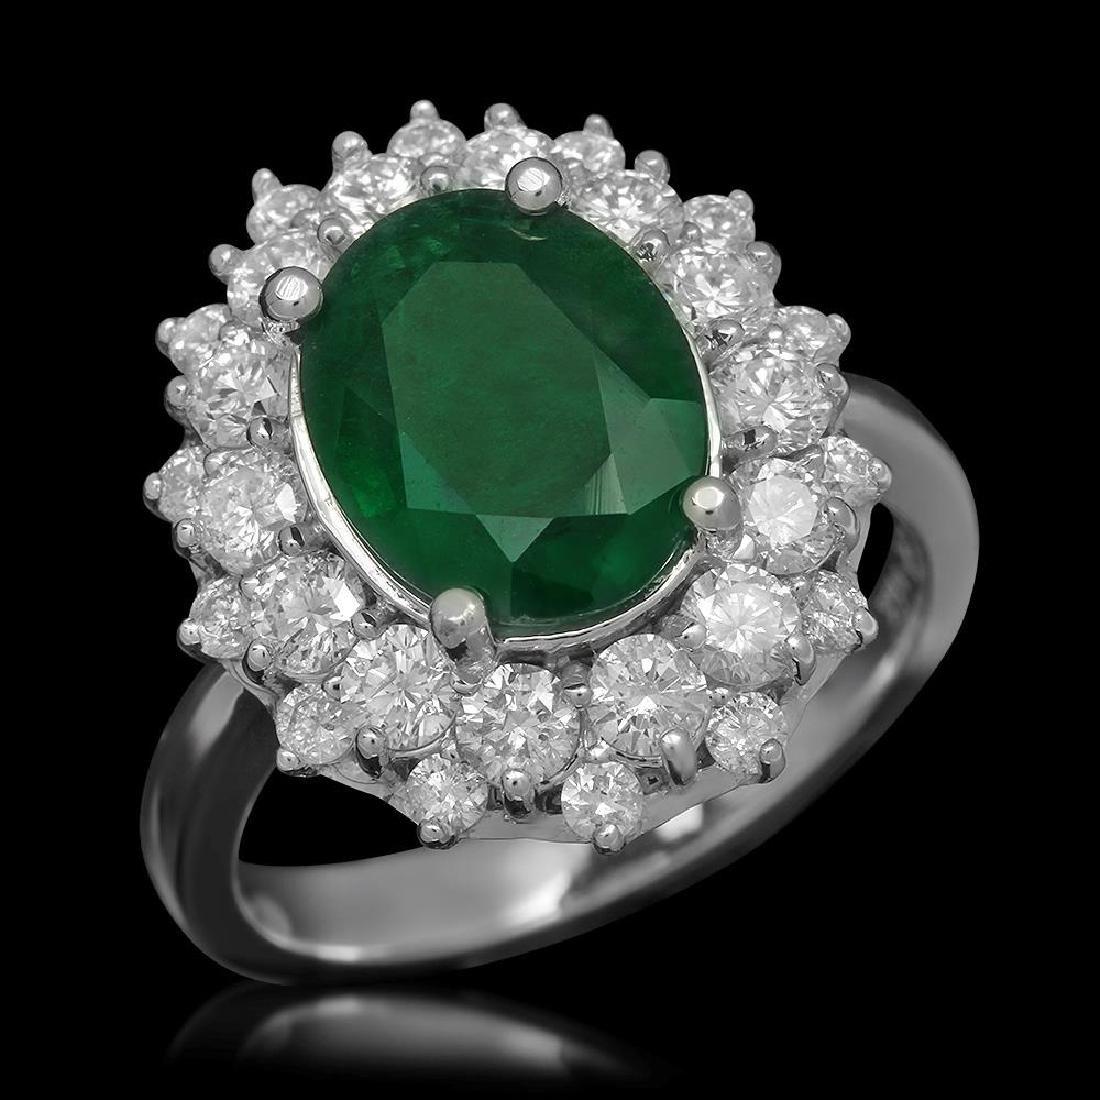 14K Gold 2.08ct Emerald 1.59ct Diamond Ring